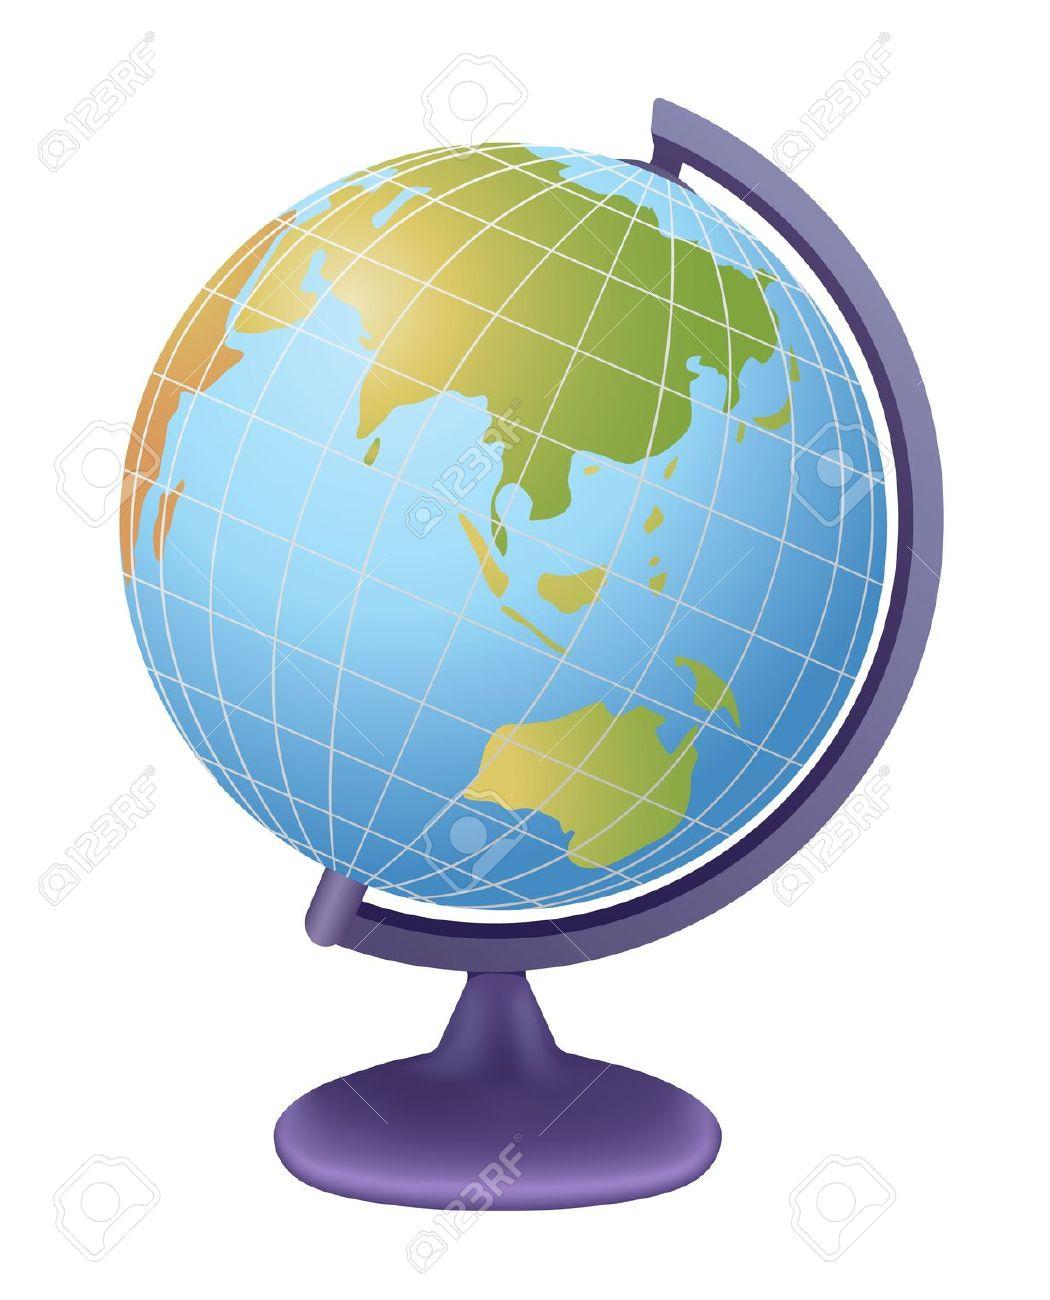 1050x1300 Globe Clipart School